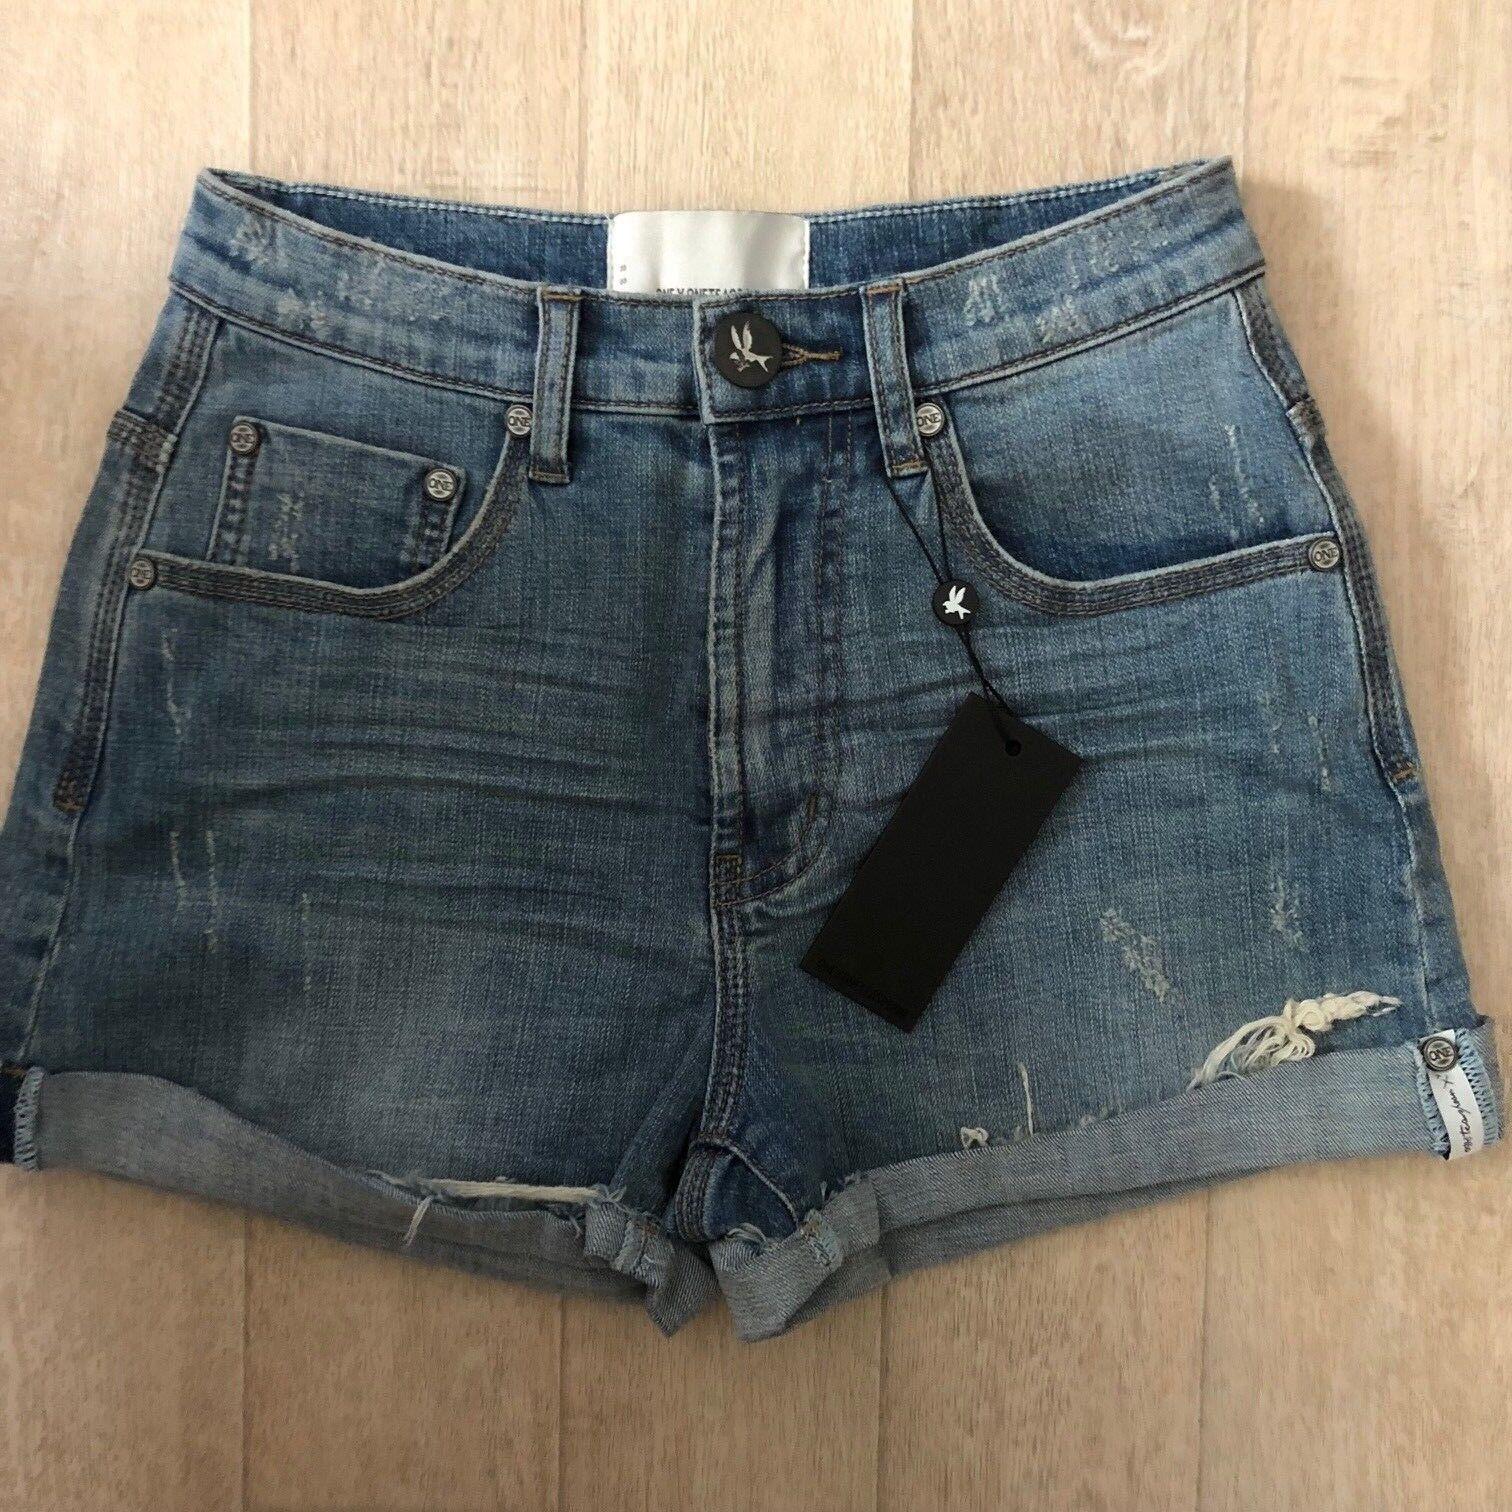 NWT One Teaspoon Harlets Shorts Jeans Size 26 Storm Boy Distressed High Waist